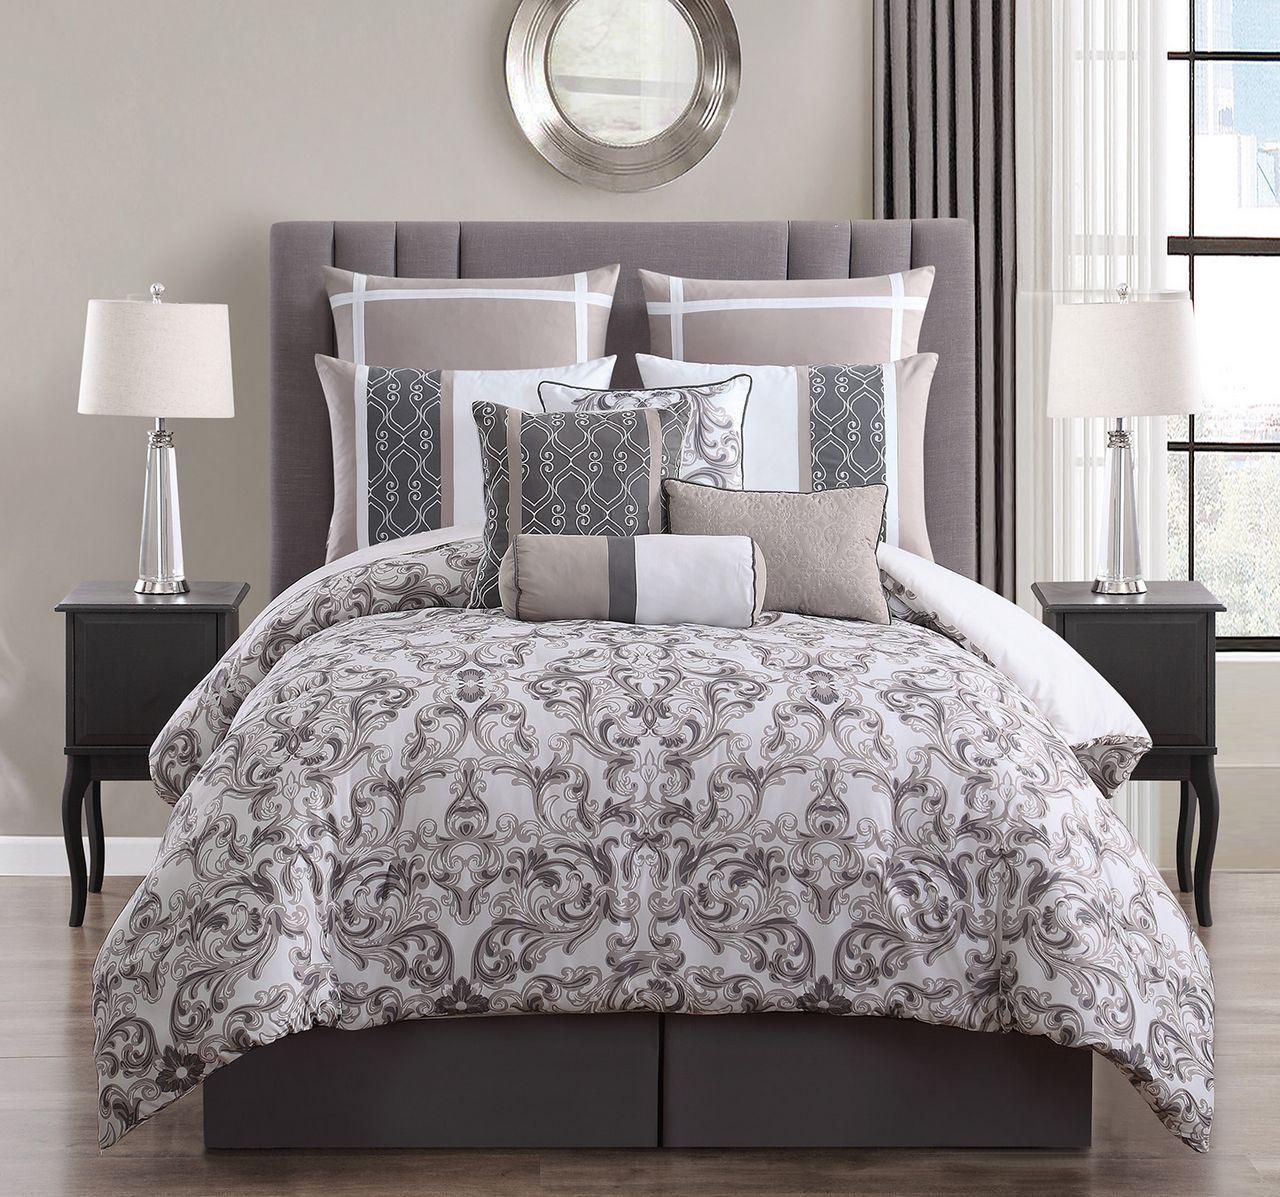 14 Piece Adeline Taupe/Ivory Bed in a Bag Set Comforter sets